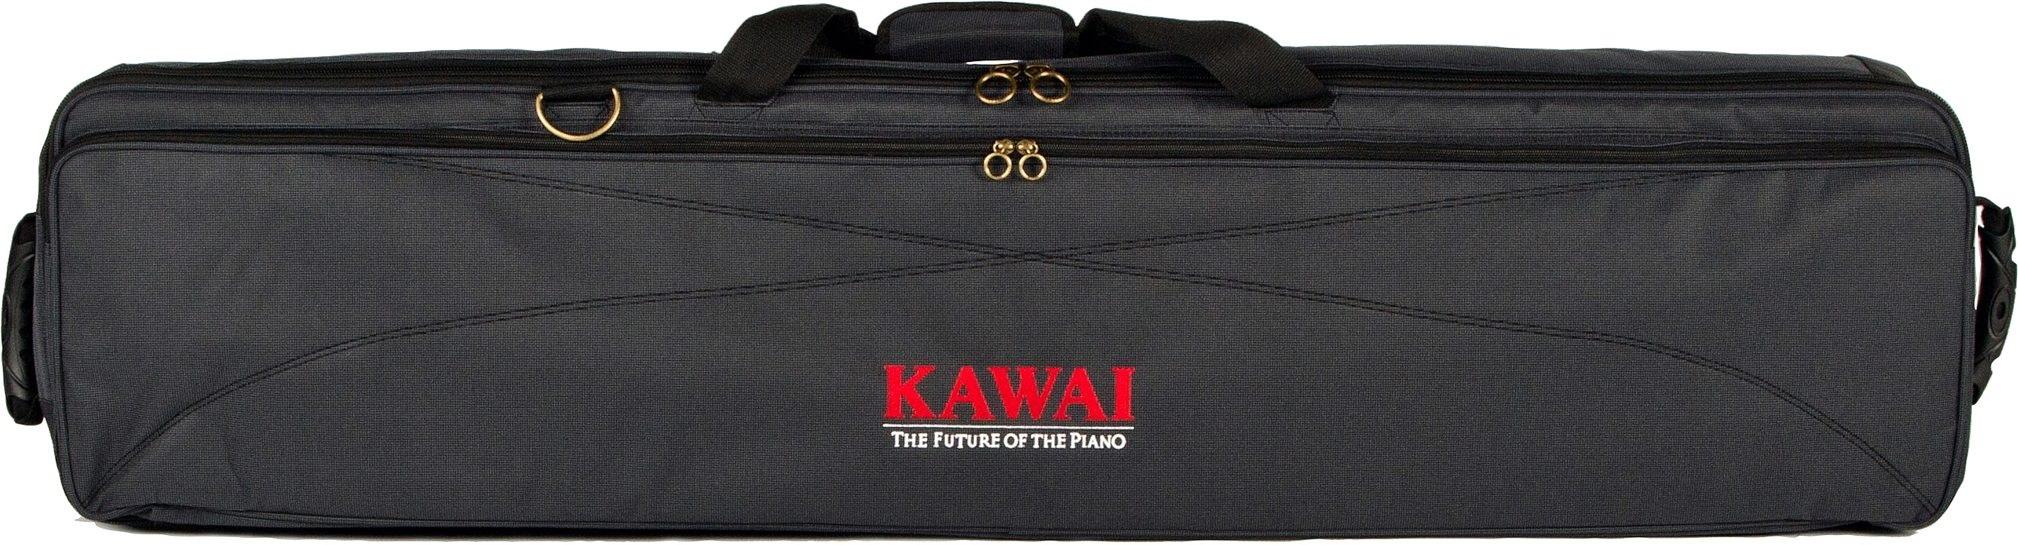 Kawai SC-2